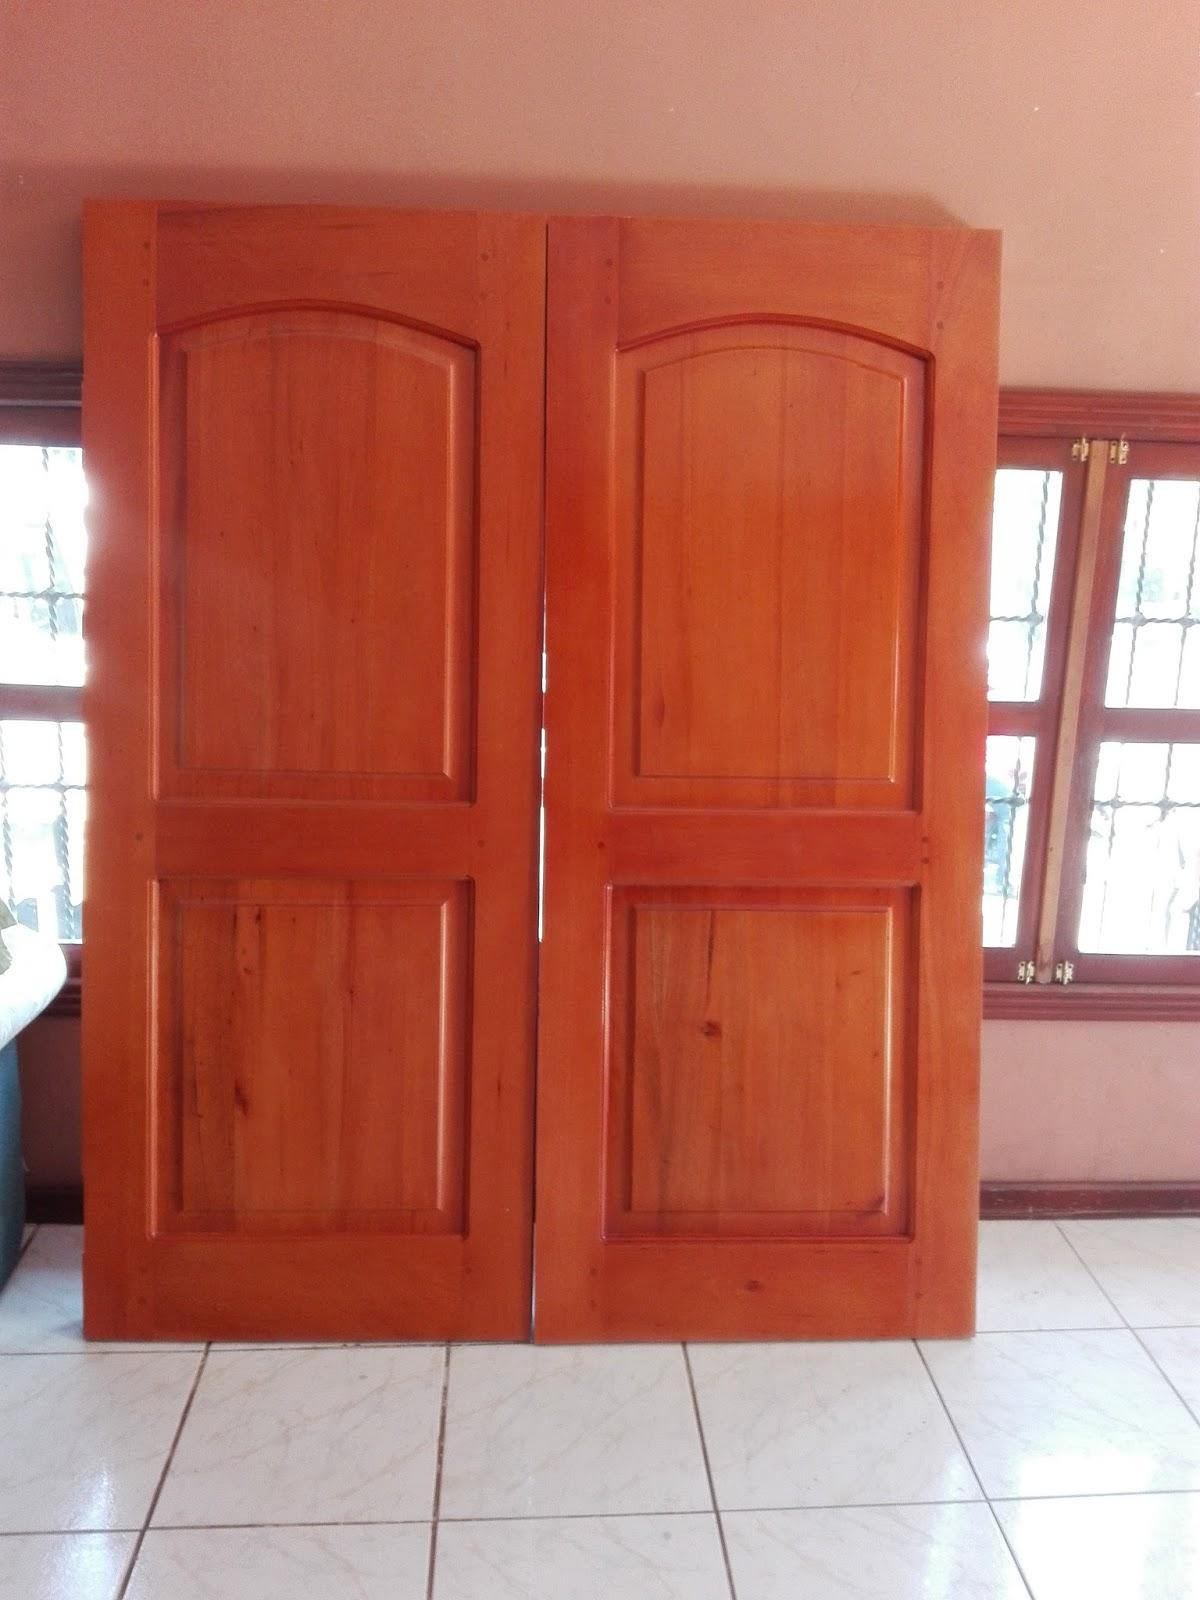 Puertas de madera s lida lolo morales furniture for Puertas madera a medida